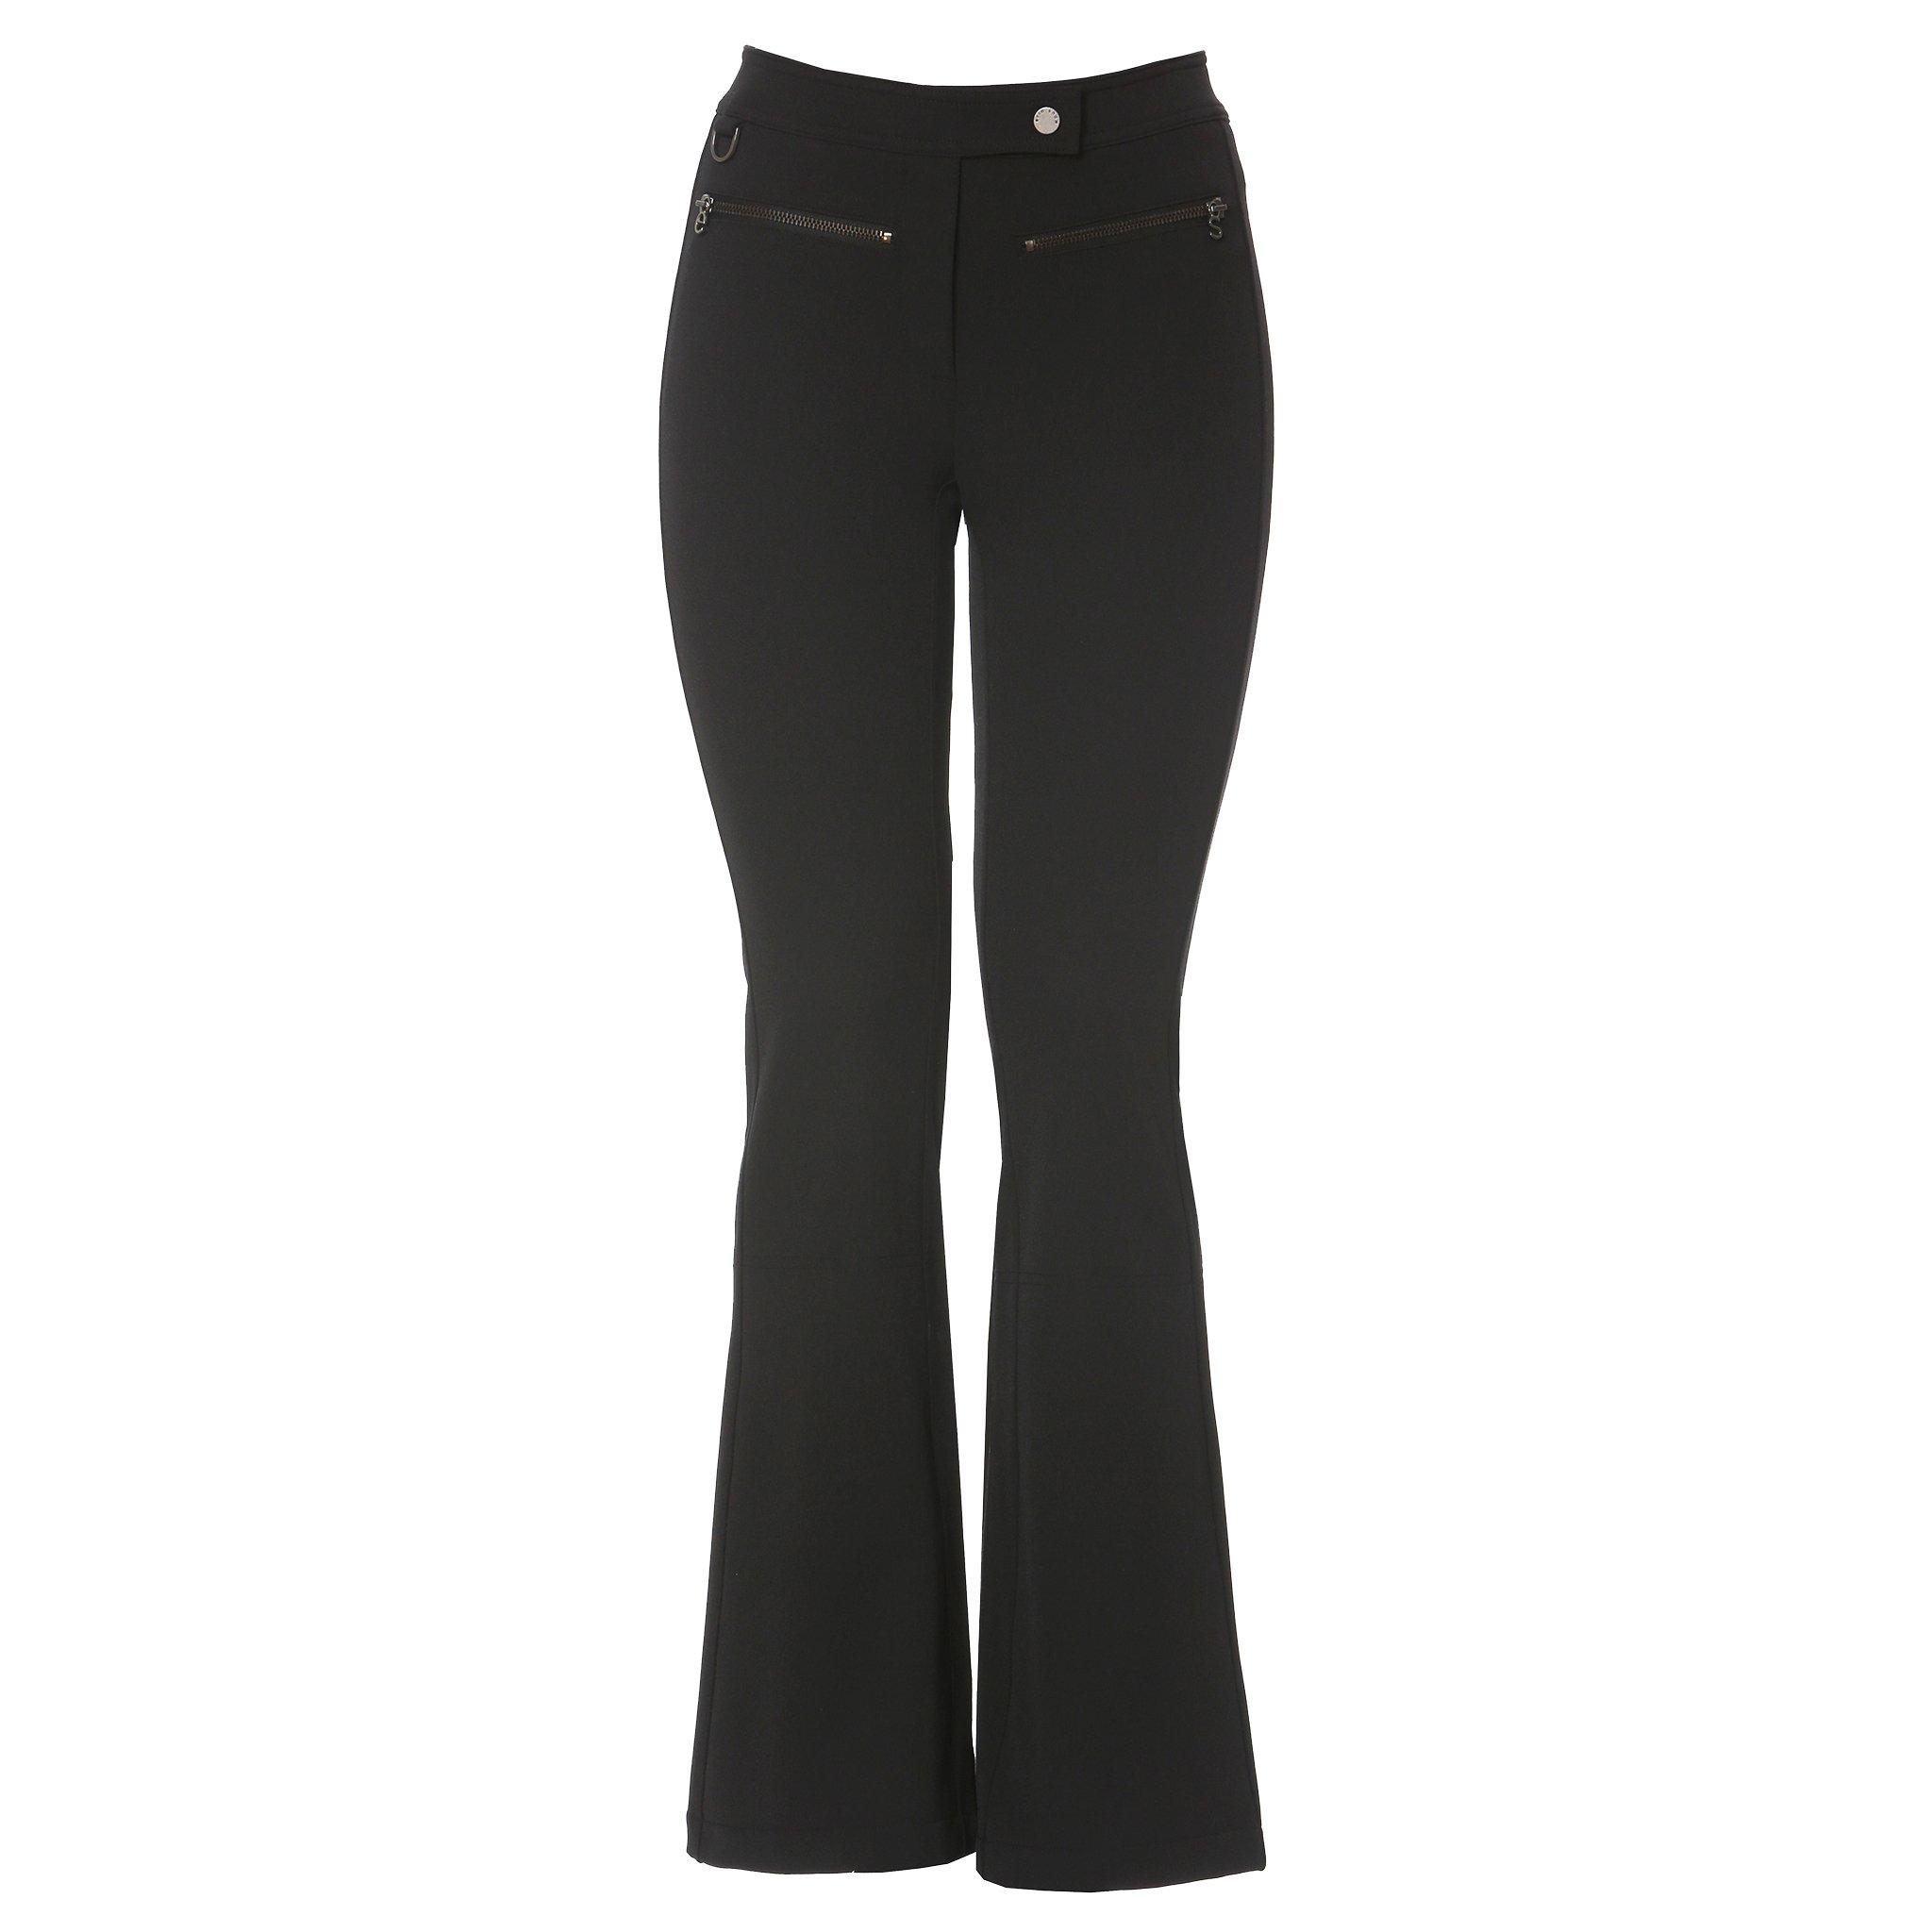 Erin Snow Women's Phia Pants In Eco Racer, Size 4, Black